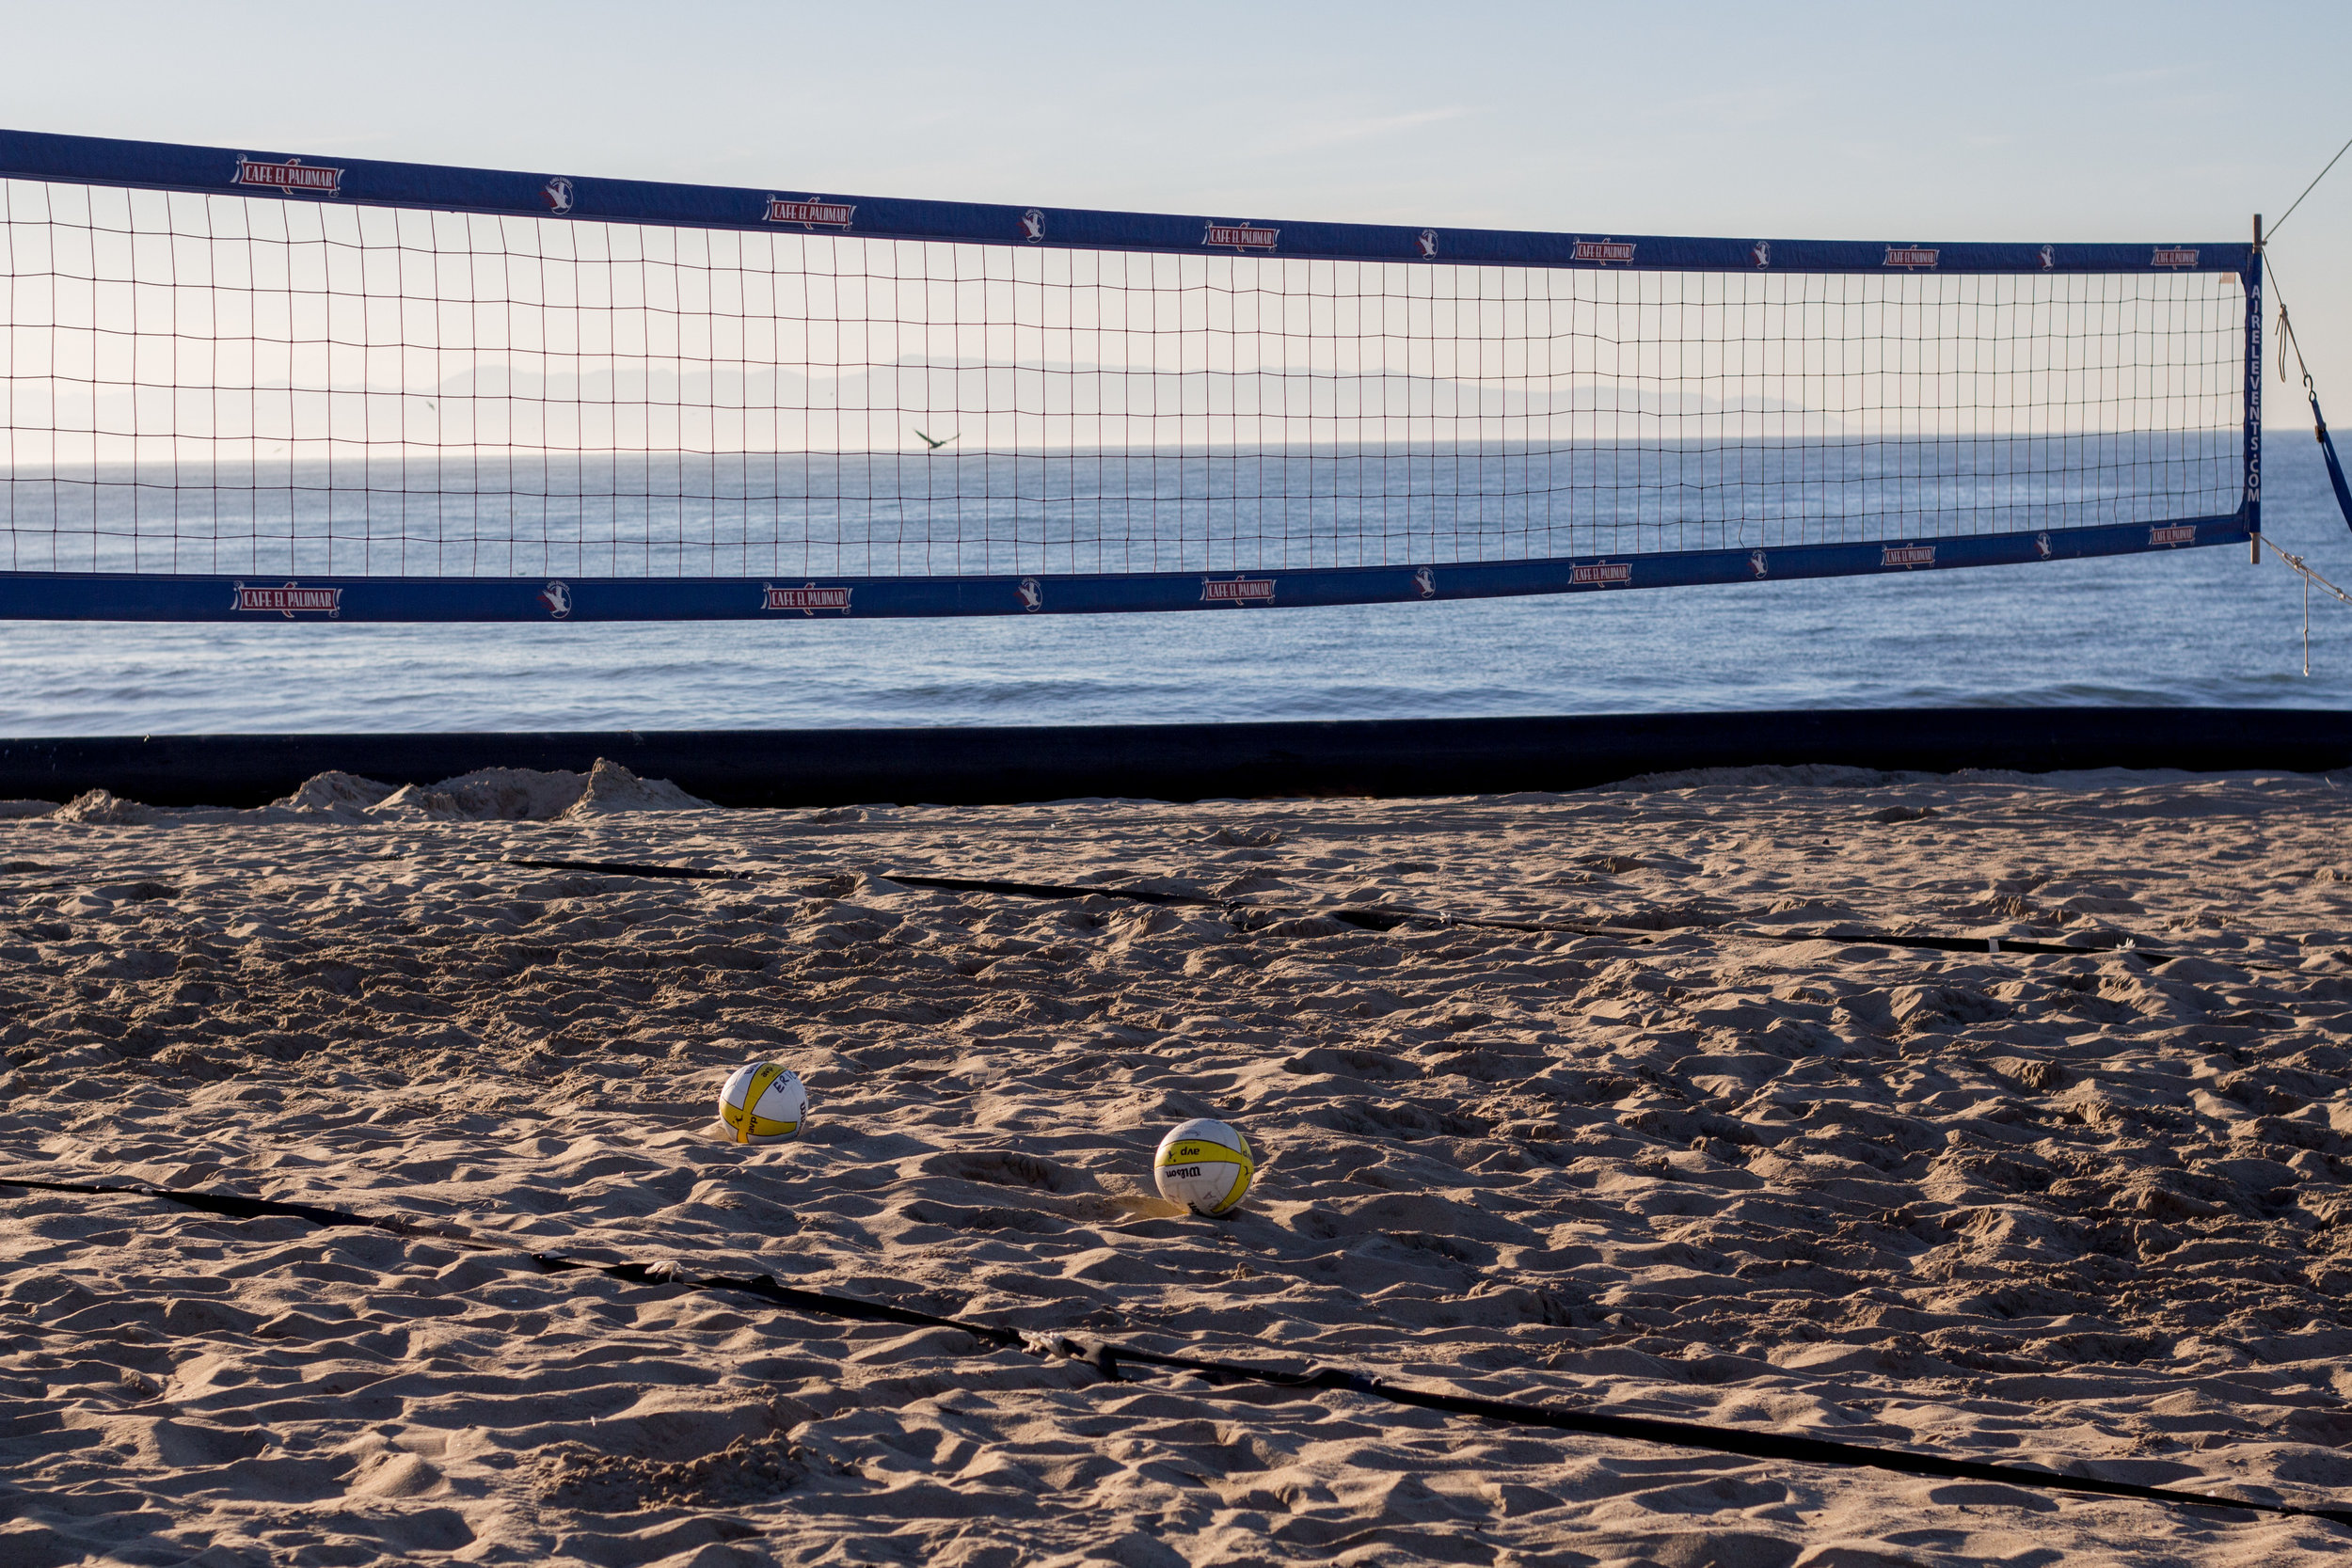 beach vball-1.jpg